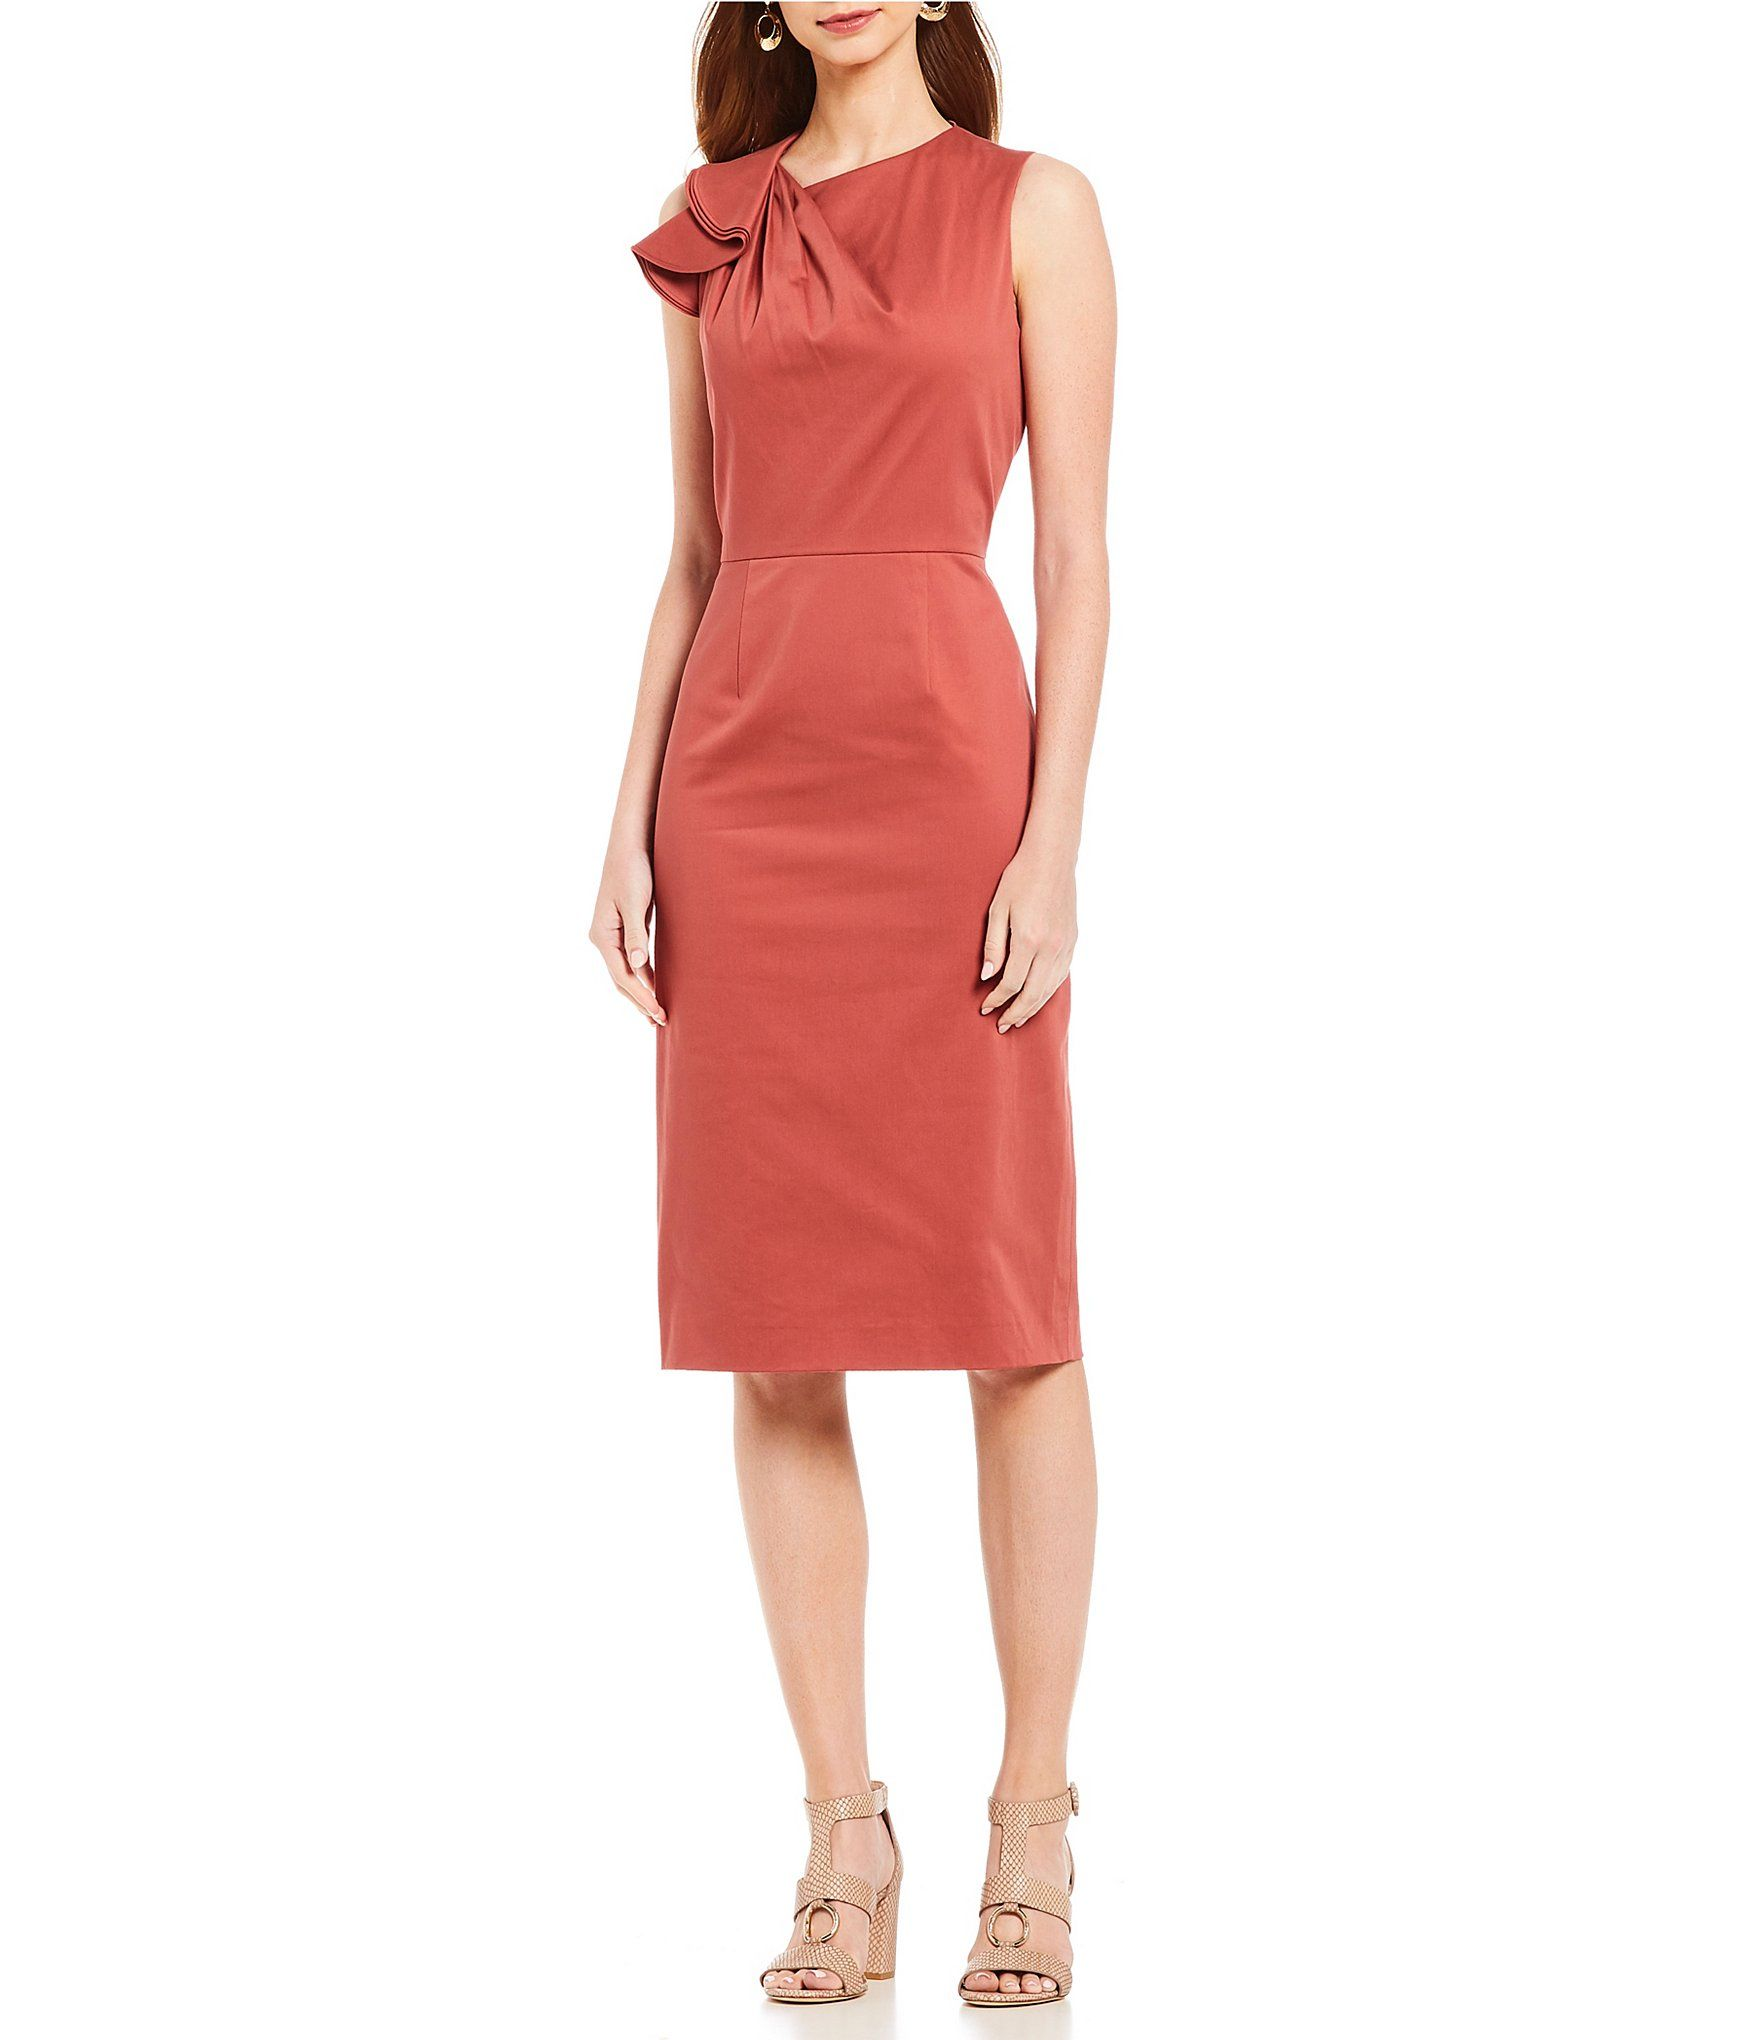 48d29a0d7db Shop for Antonio Melani Mercedes Ruffle Shoulder Midi Dress at Dillards.com.  Visit Dillards.com to find clothing